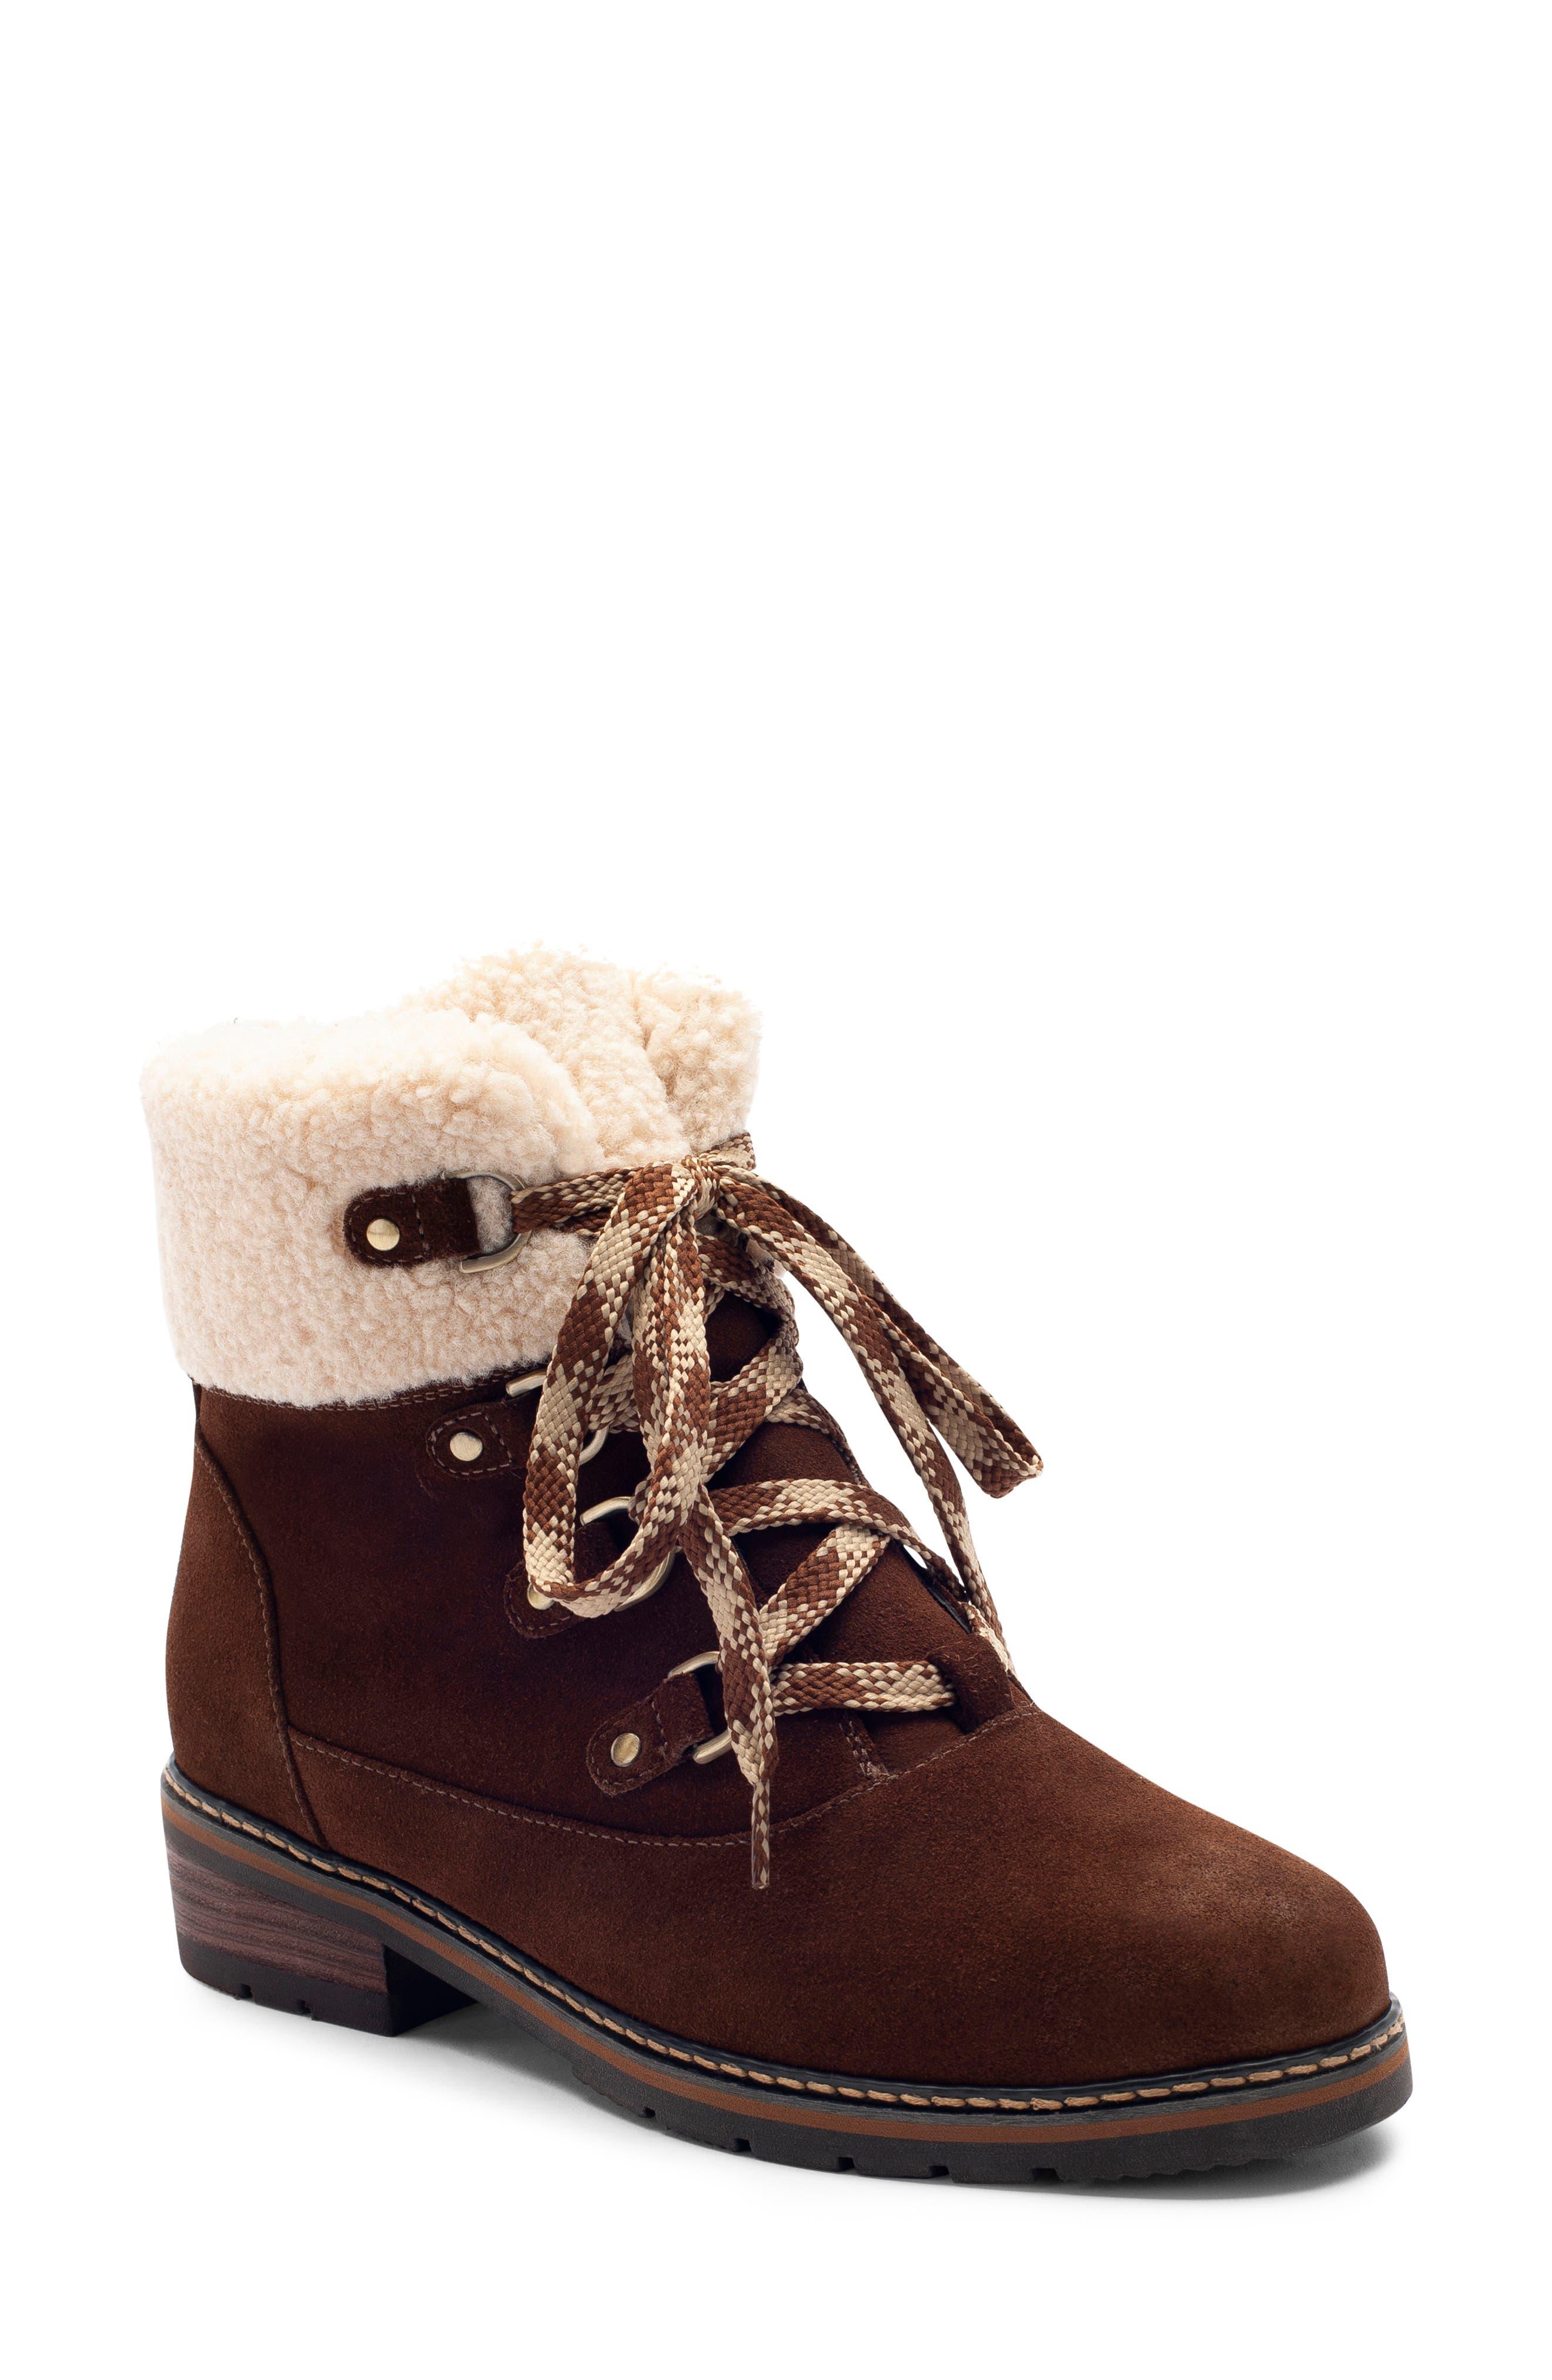 Blondo Vanessa Waterproof Boot, Brown